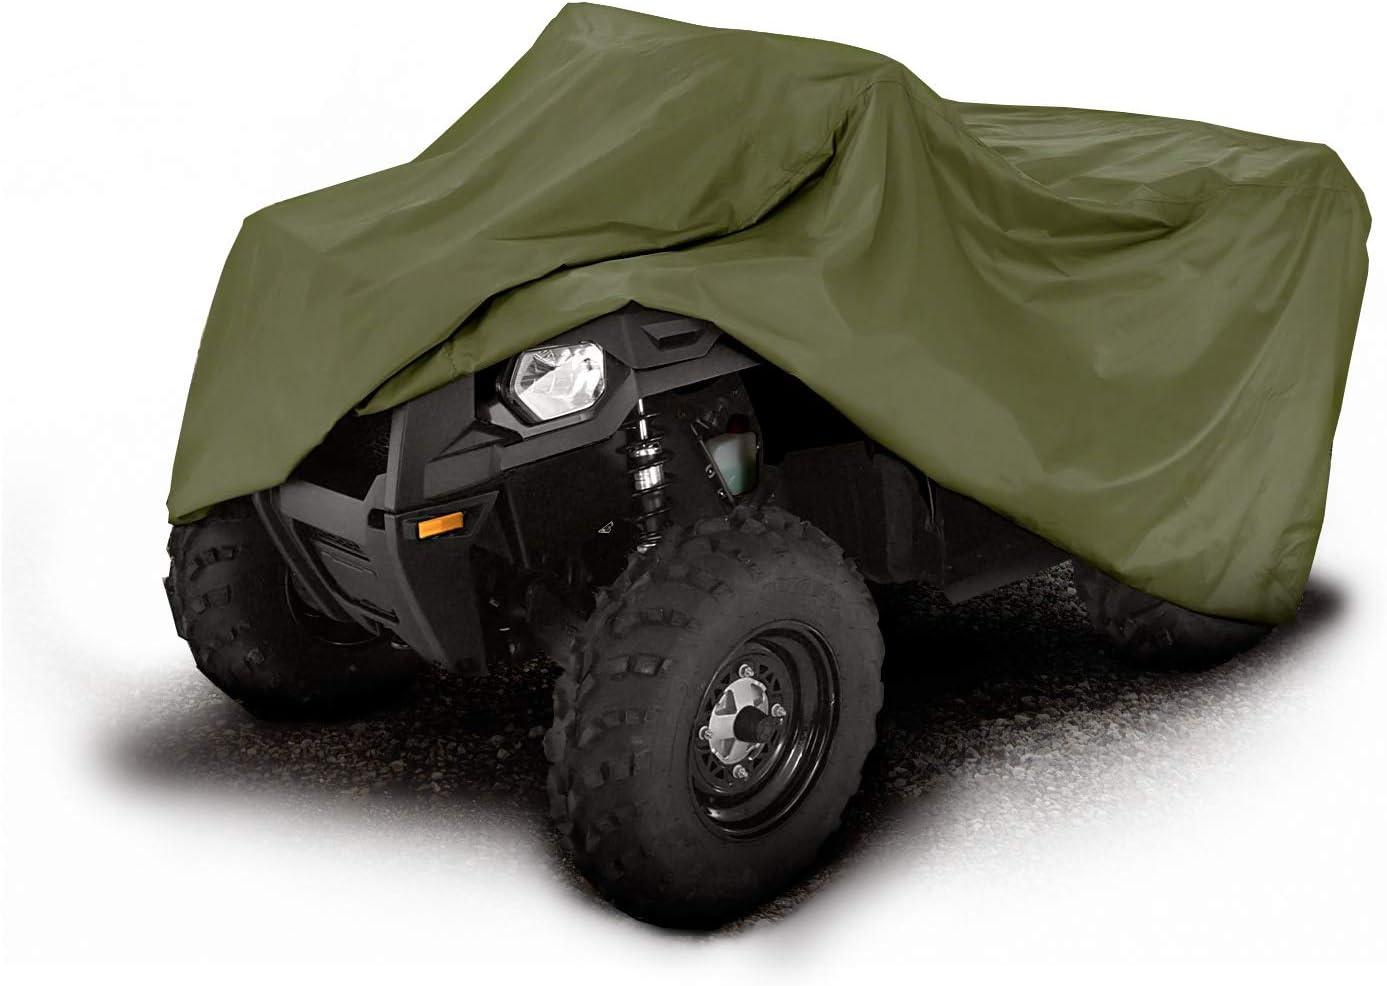 L Camo 190T WaterProof Quad Bike Tractor ATV Storage Cover Fit for Polaris Honda